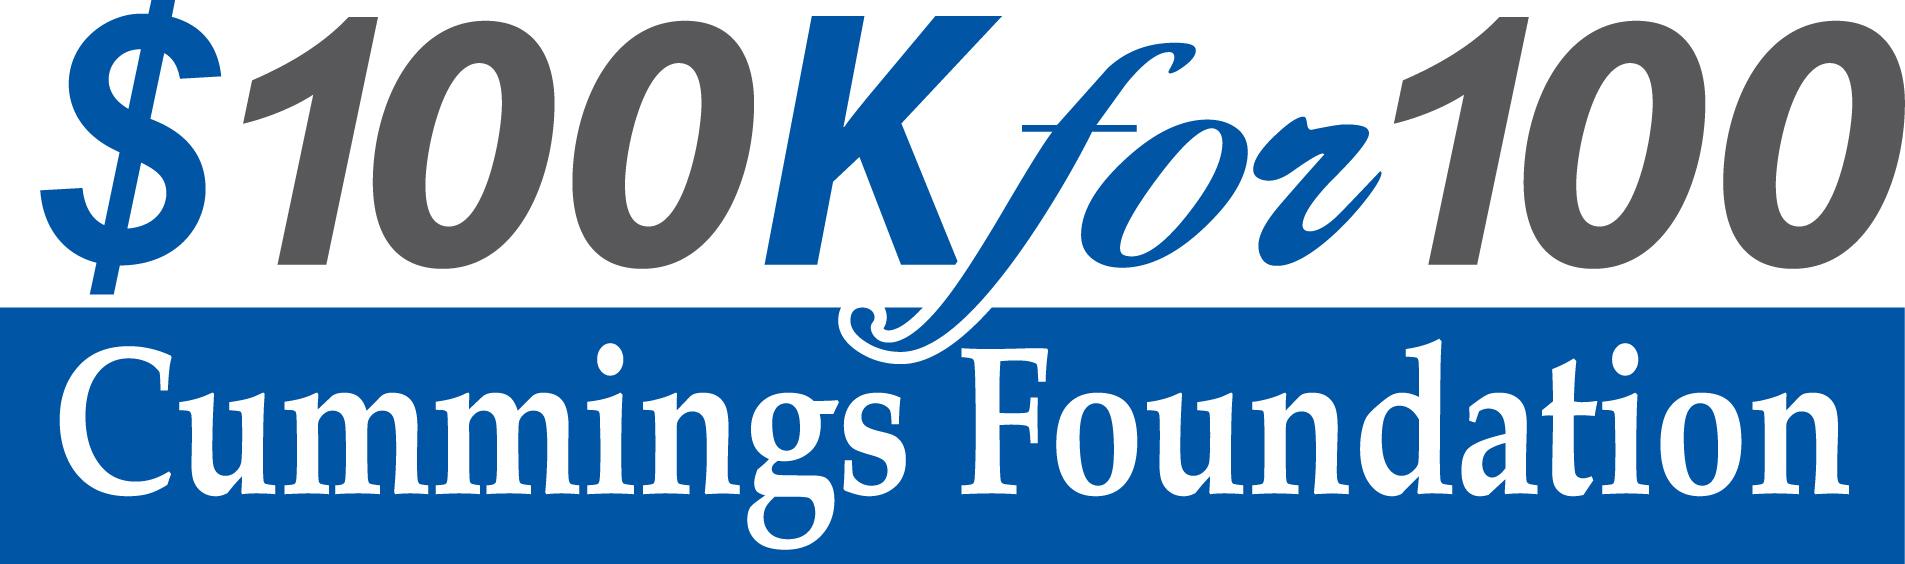 $100k For 100 Cummings Foundation